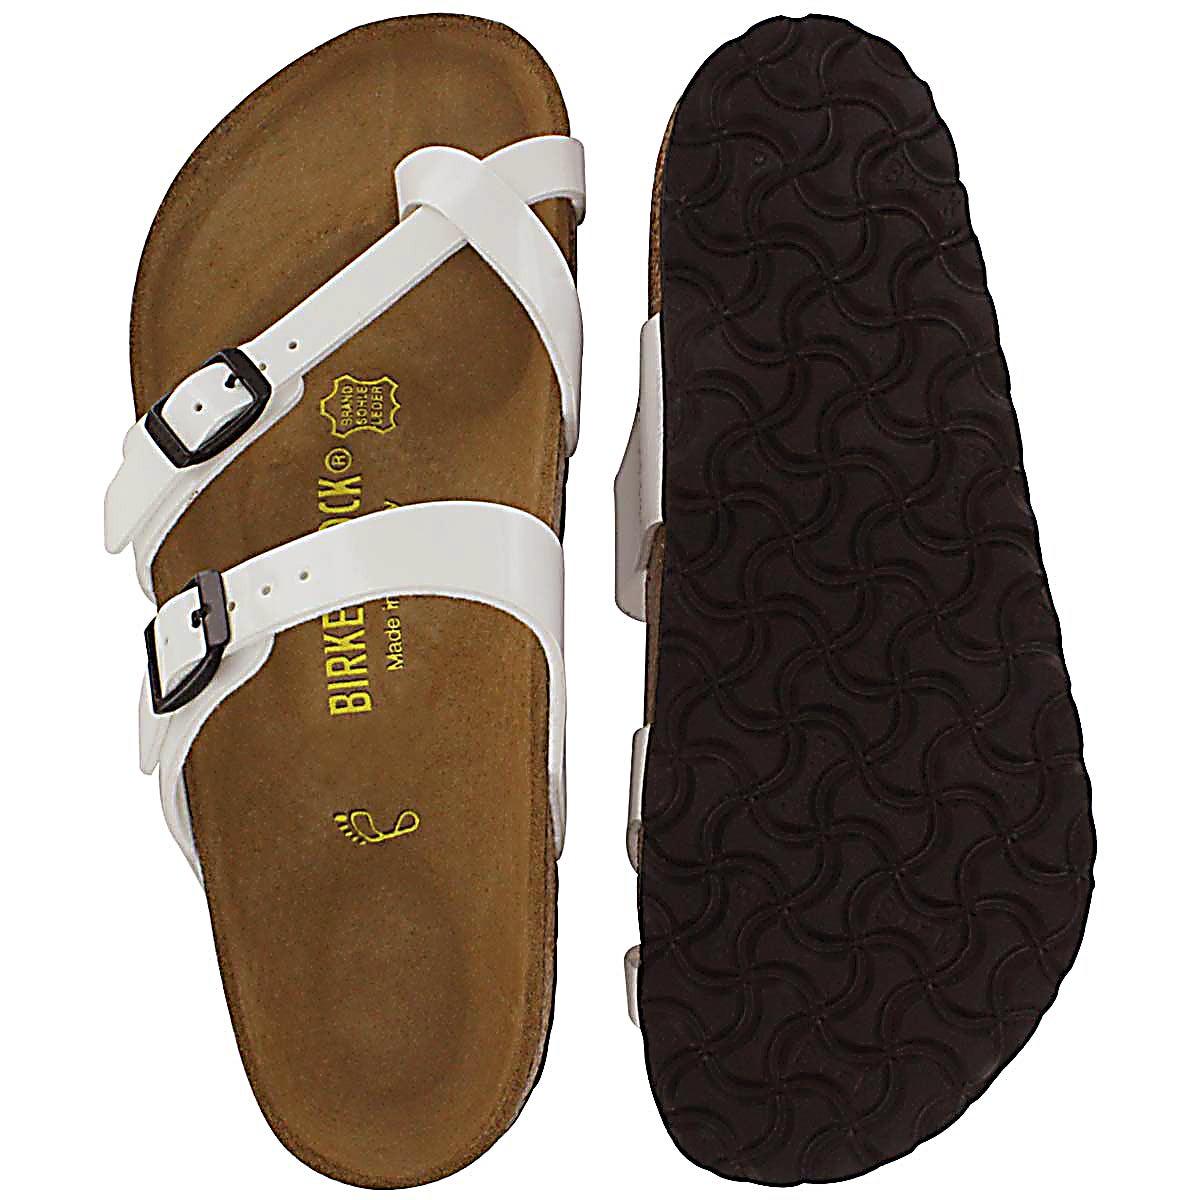 Lds Mayari  white toe sleeve thong